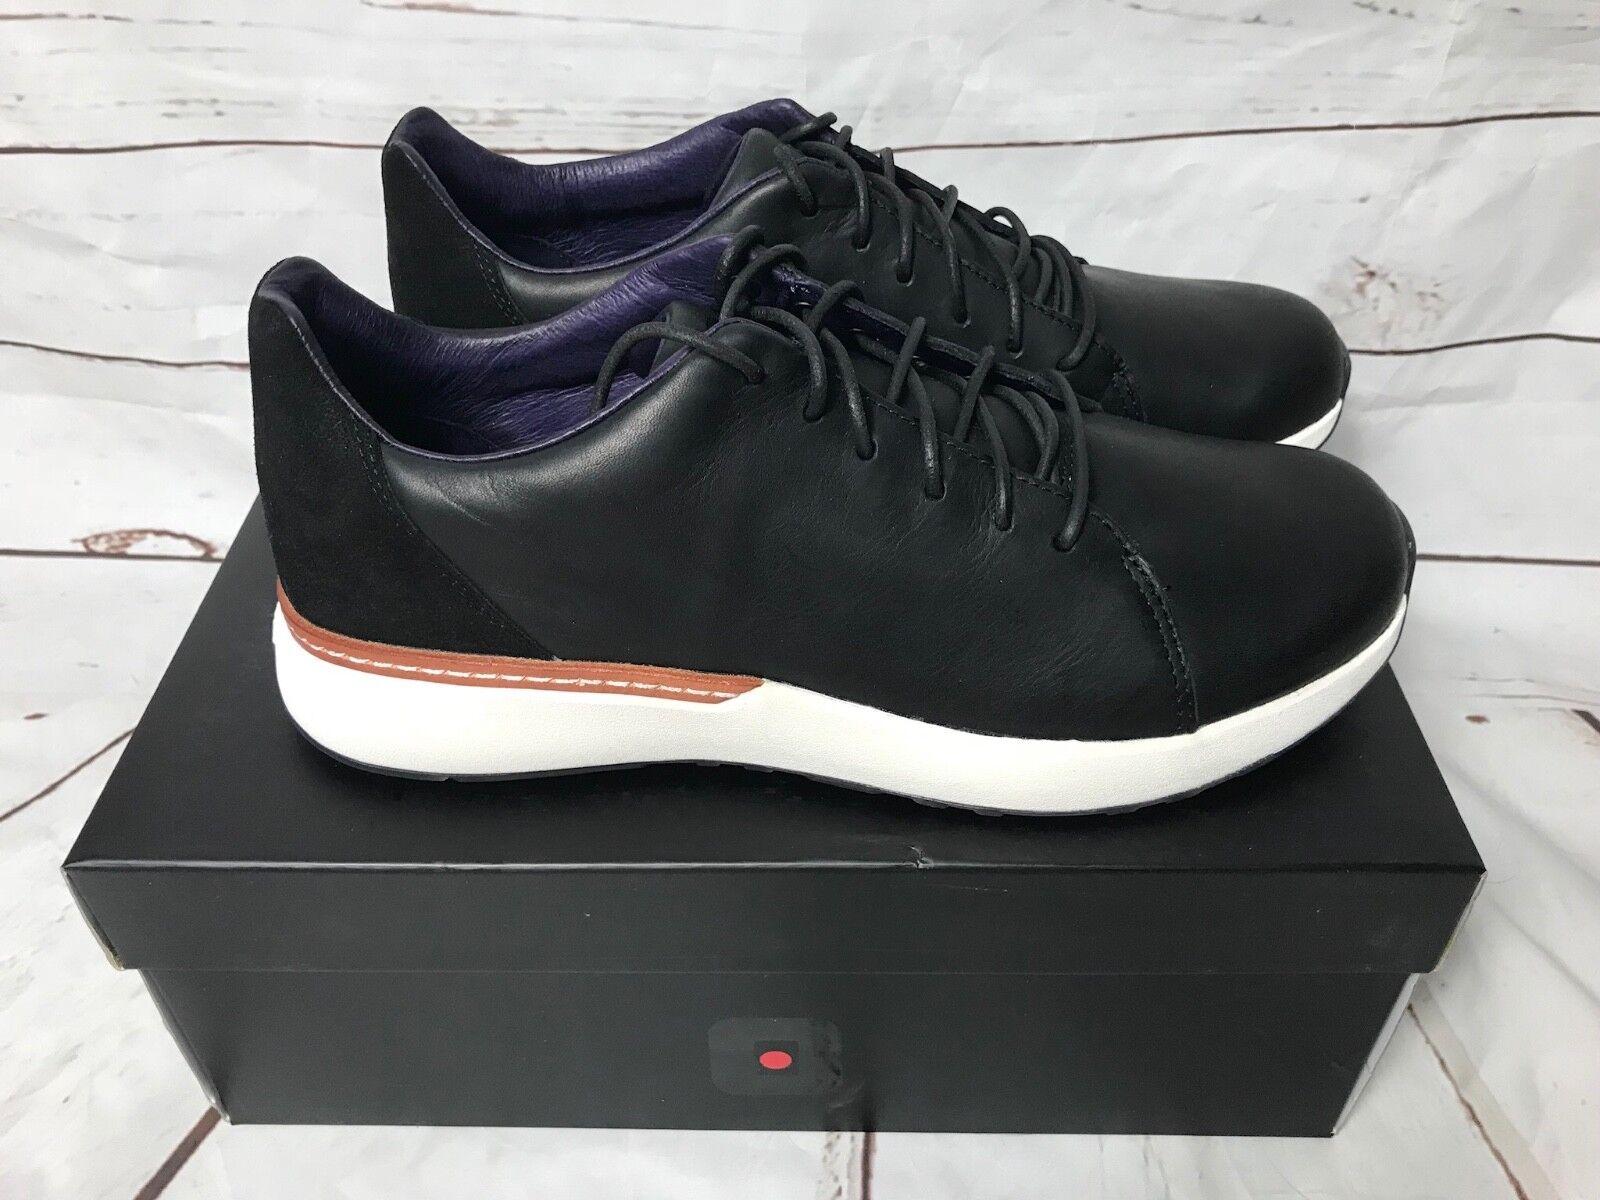 Tsubo Yobo Contrast Men's Leather Suede Sneaker Black Size 10 Style 2263-001